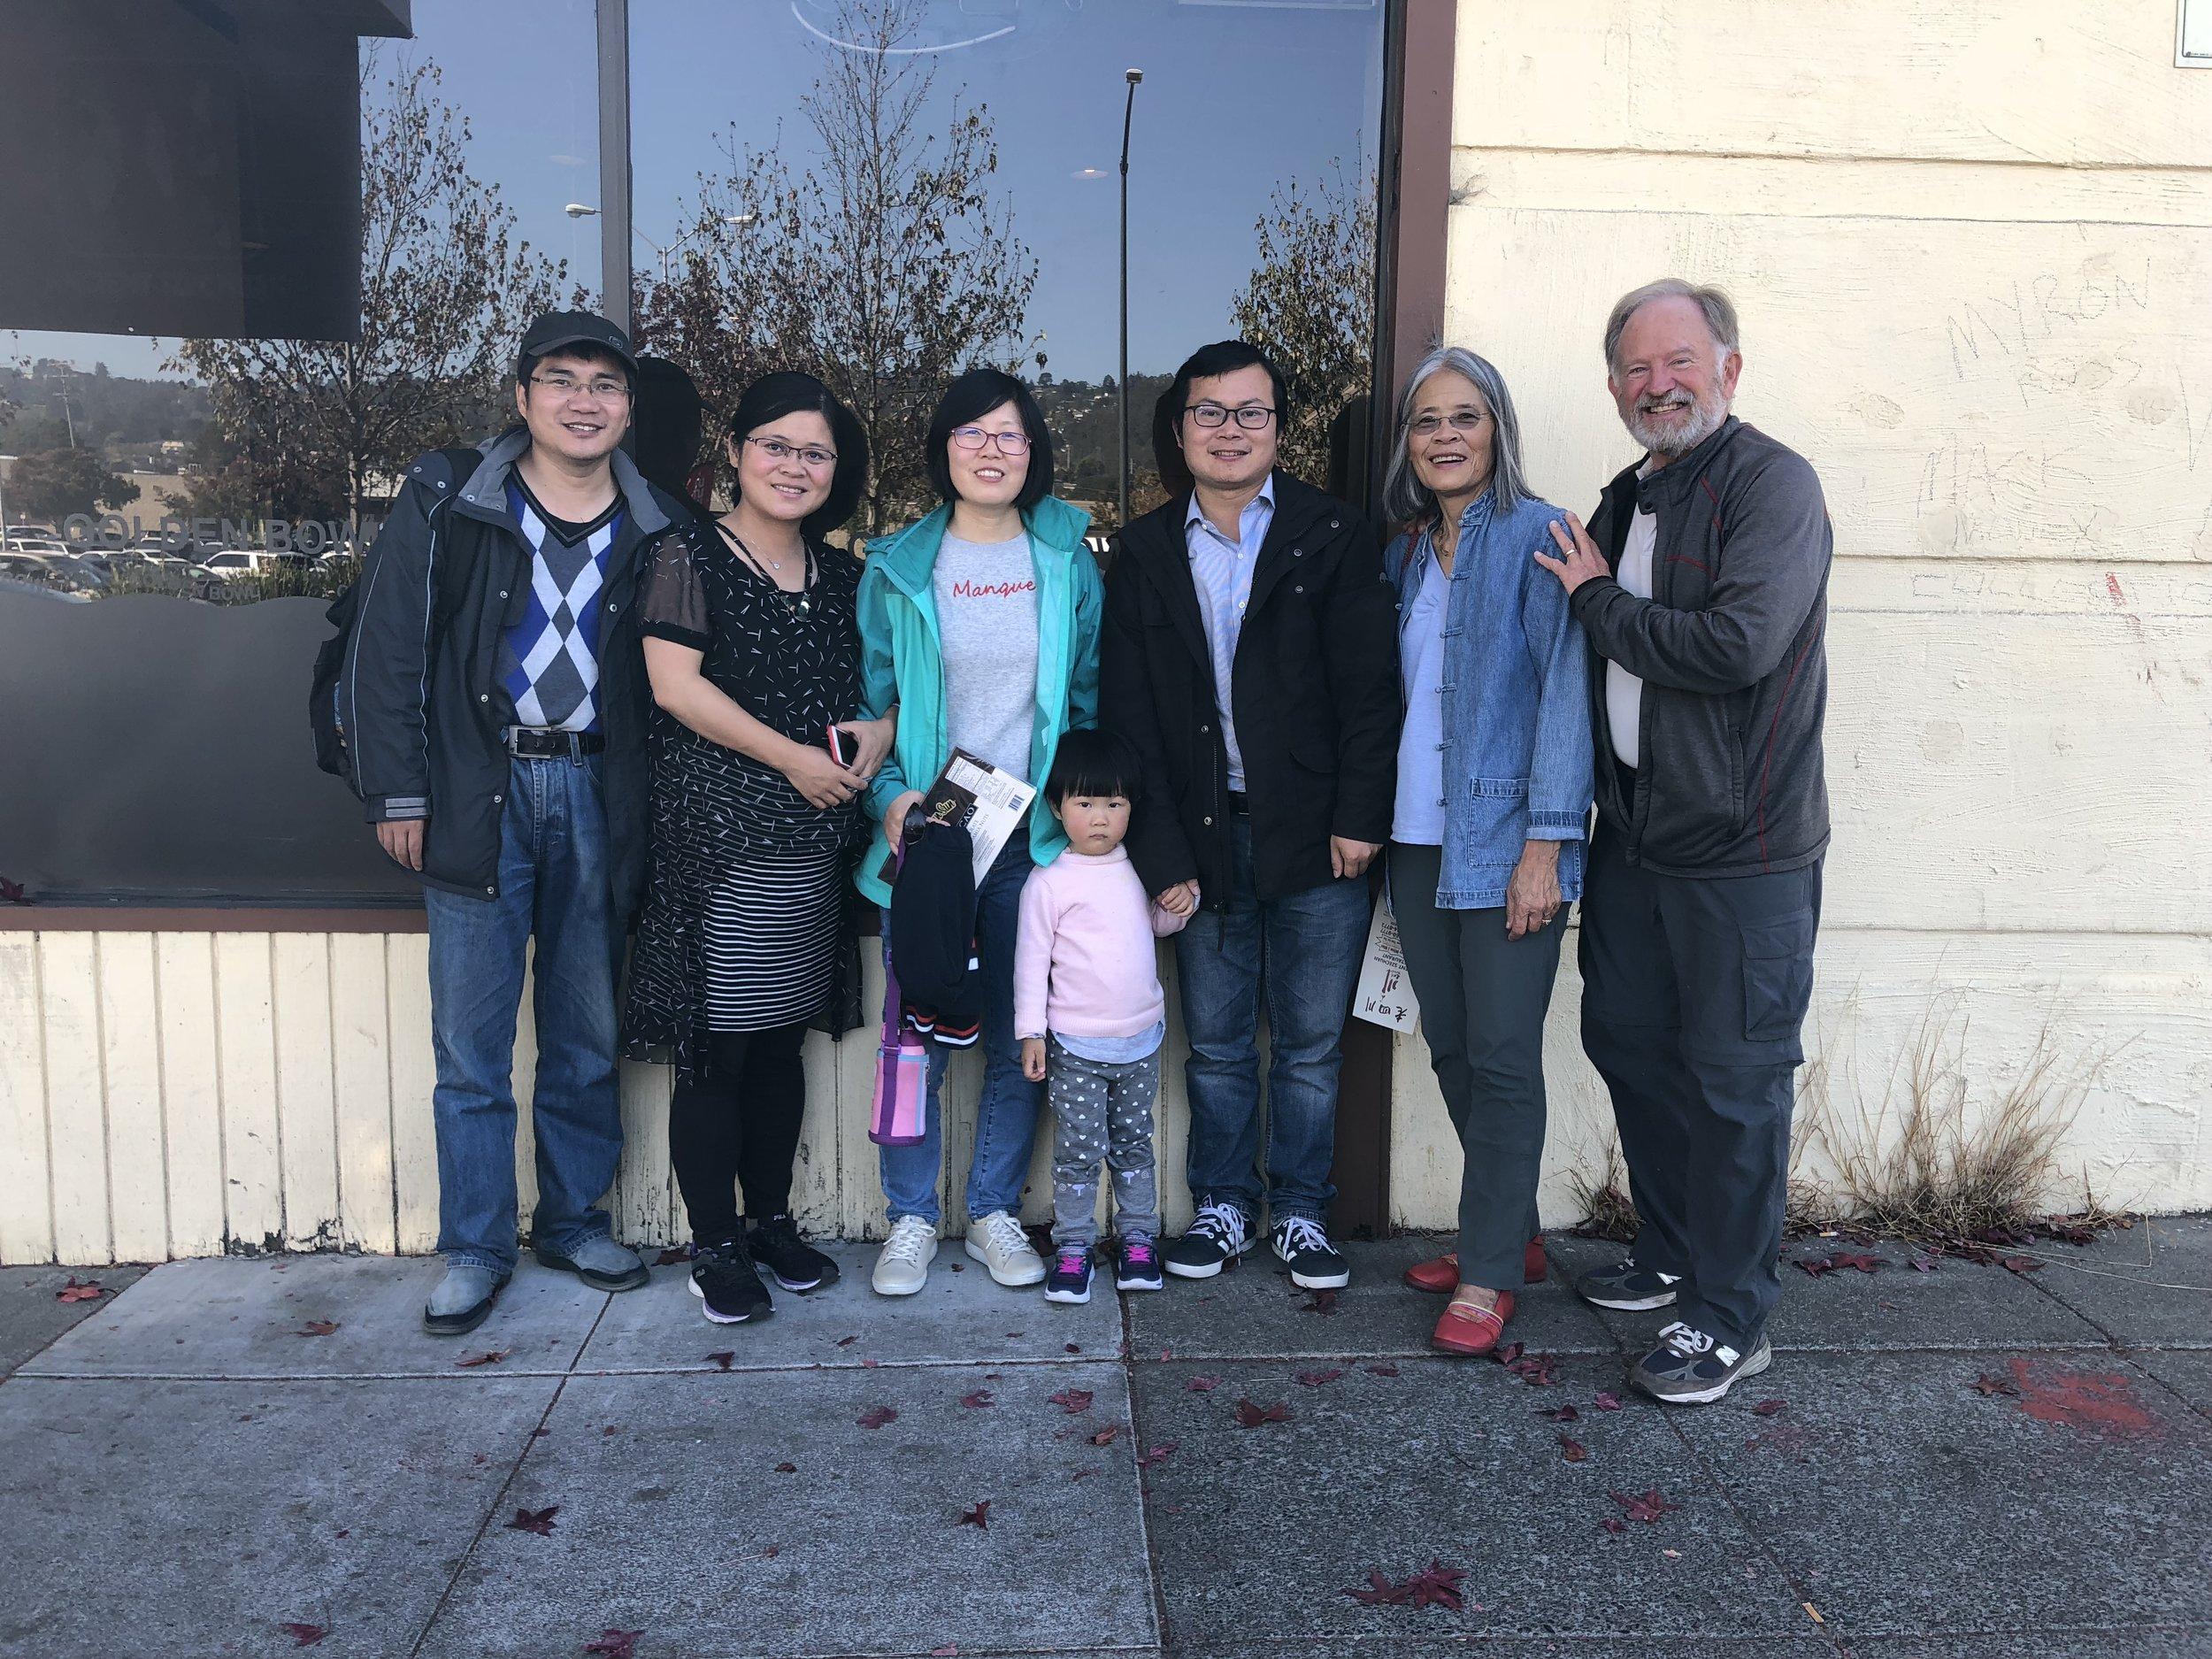 Danesh, Celia, YaZheng Ziyan. Zhong, Jadyne, and me